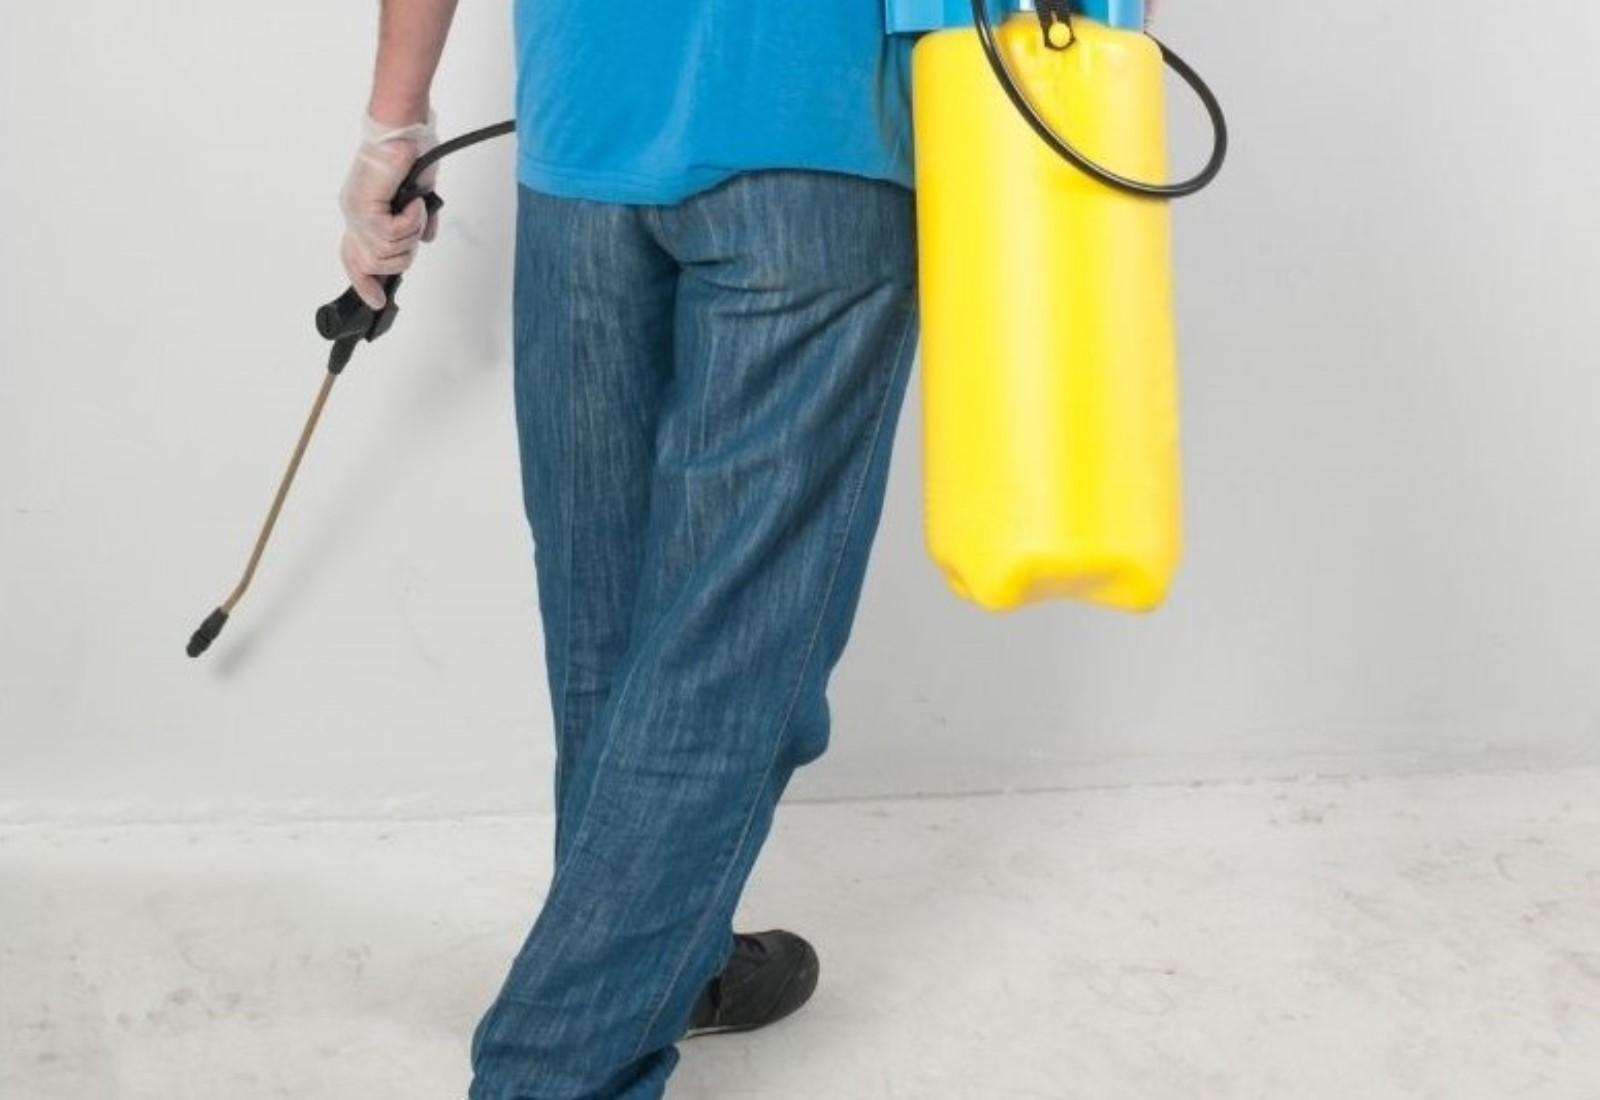 Fly spray infestation elimination extermination pest control